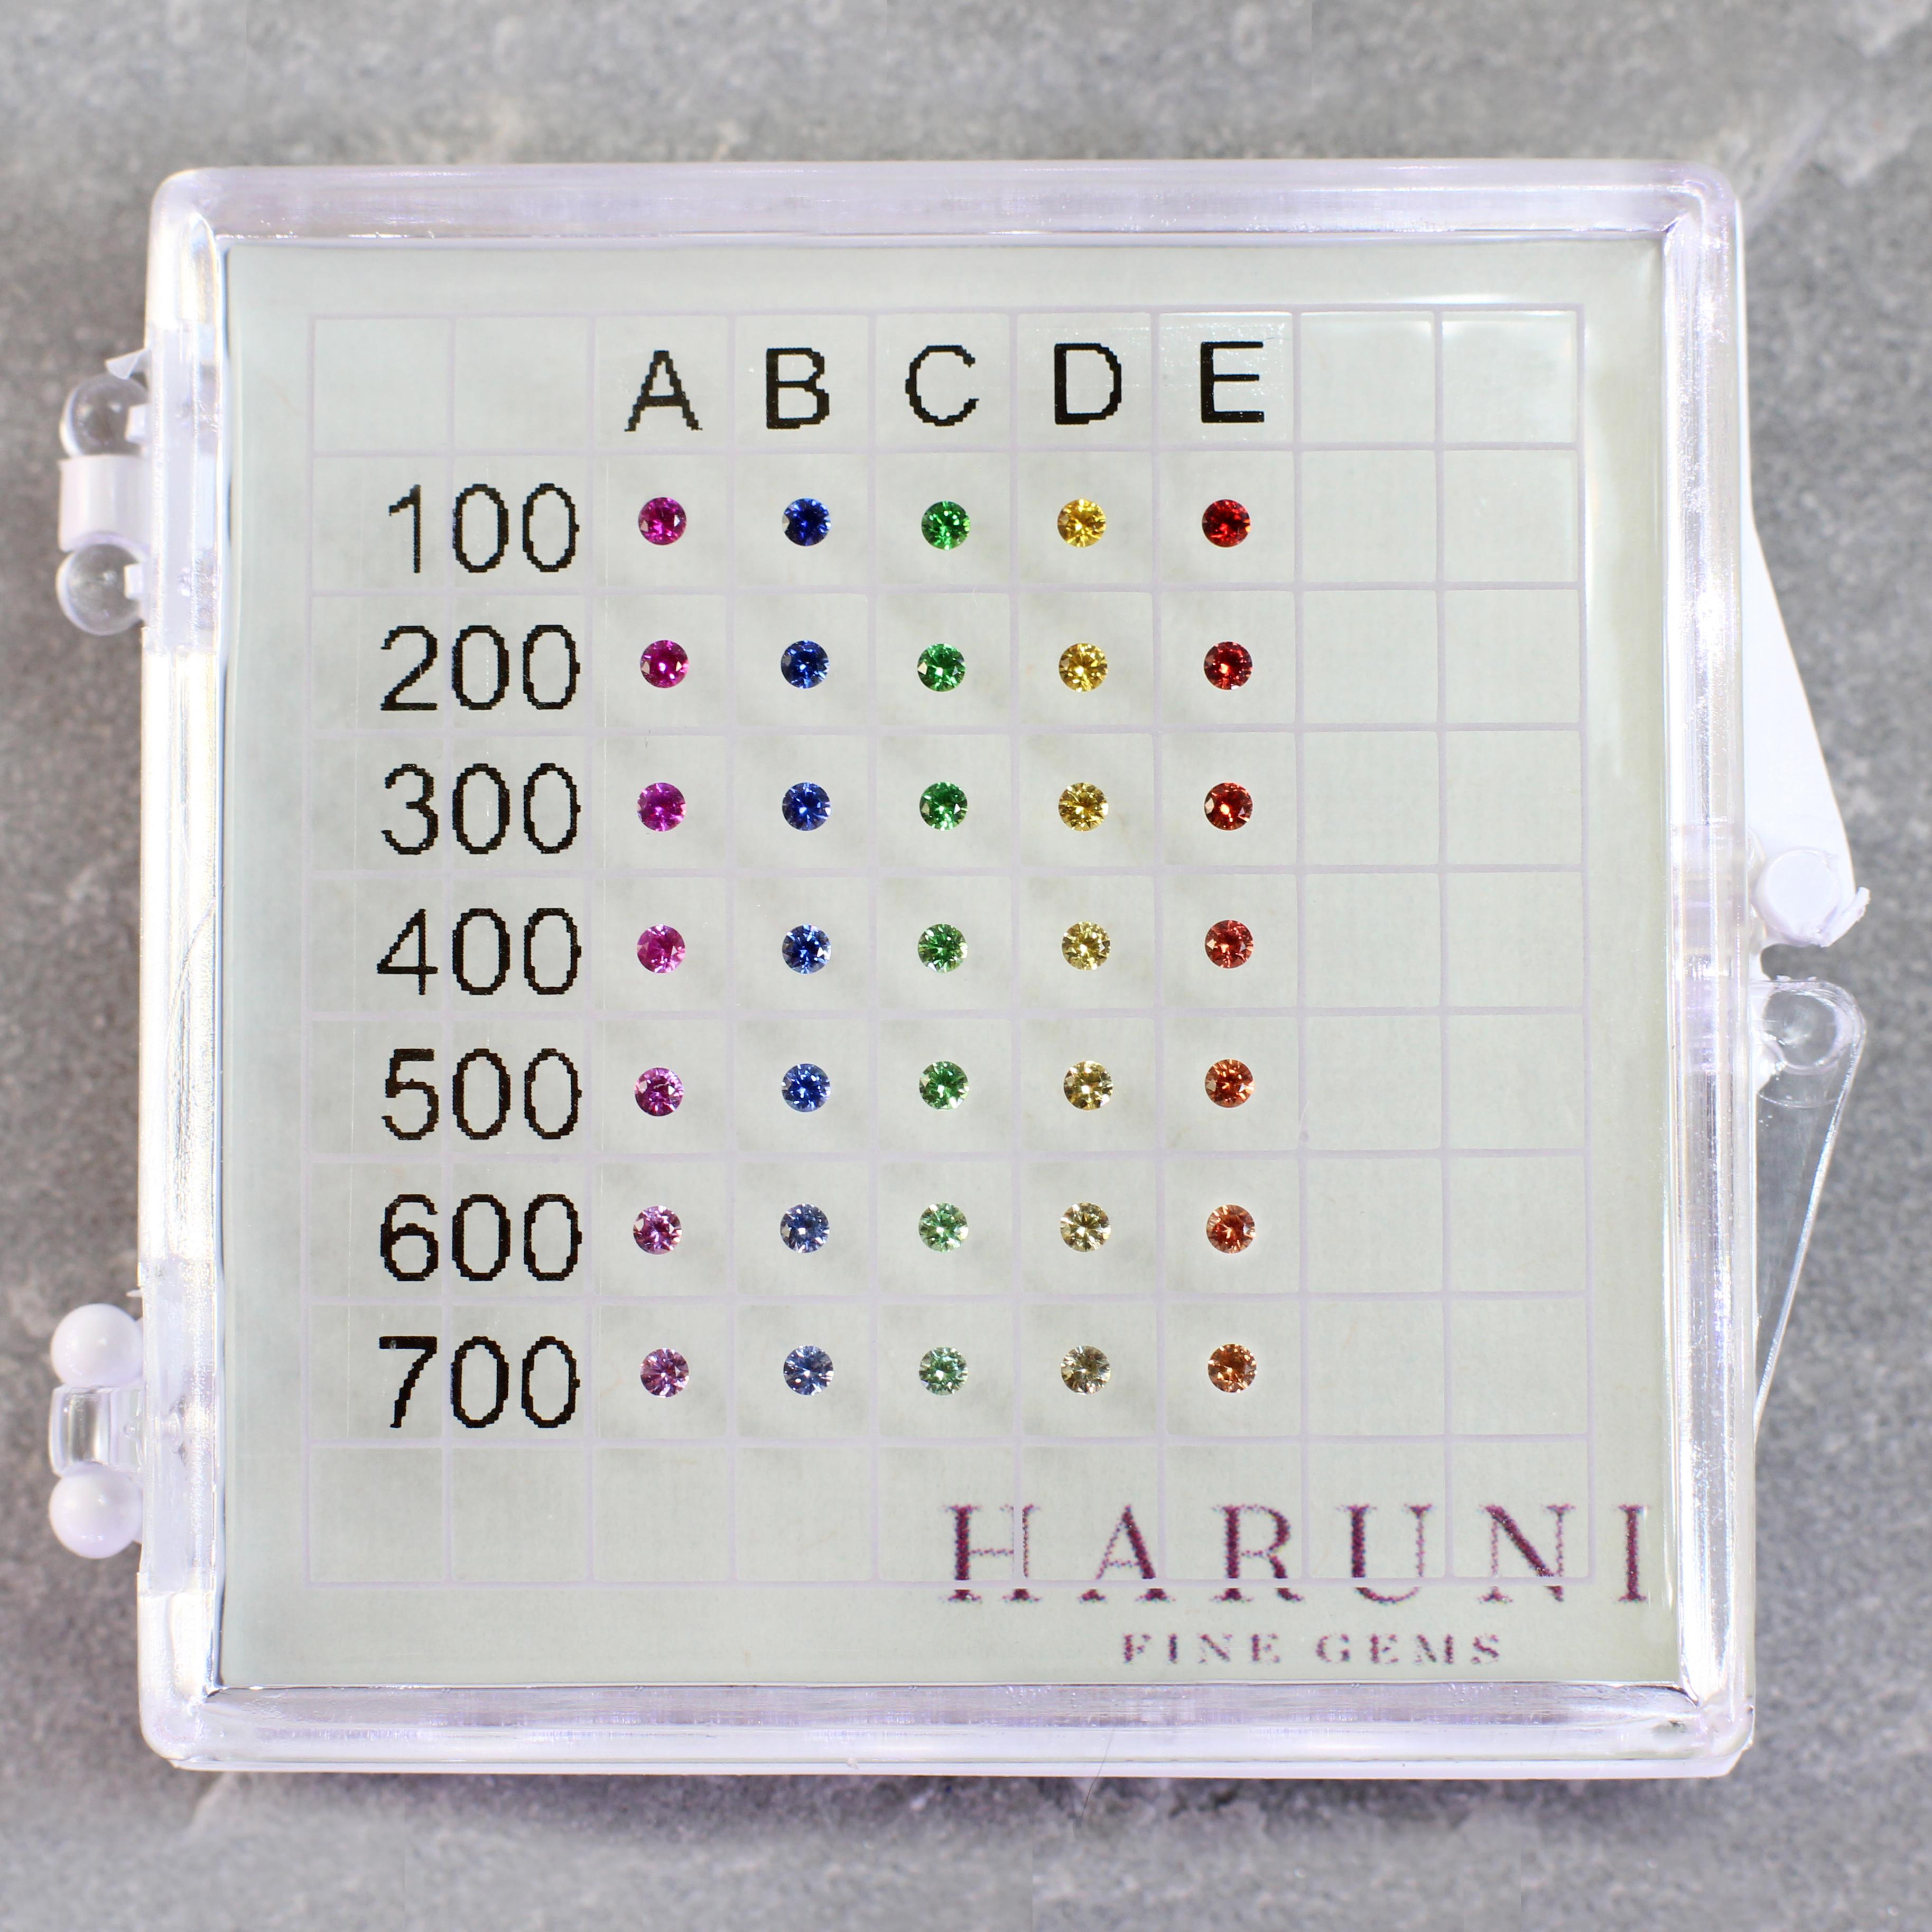 Colour Gem Master Card haruni fine gems